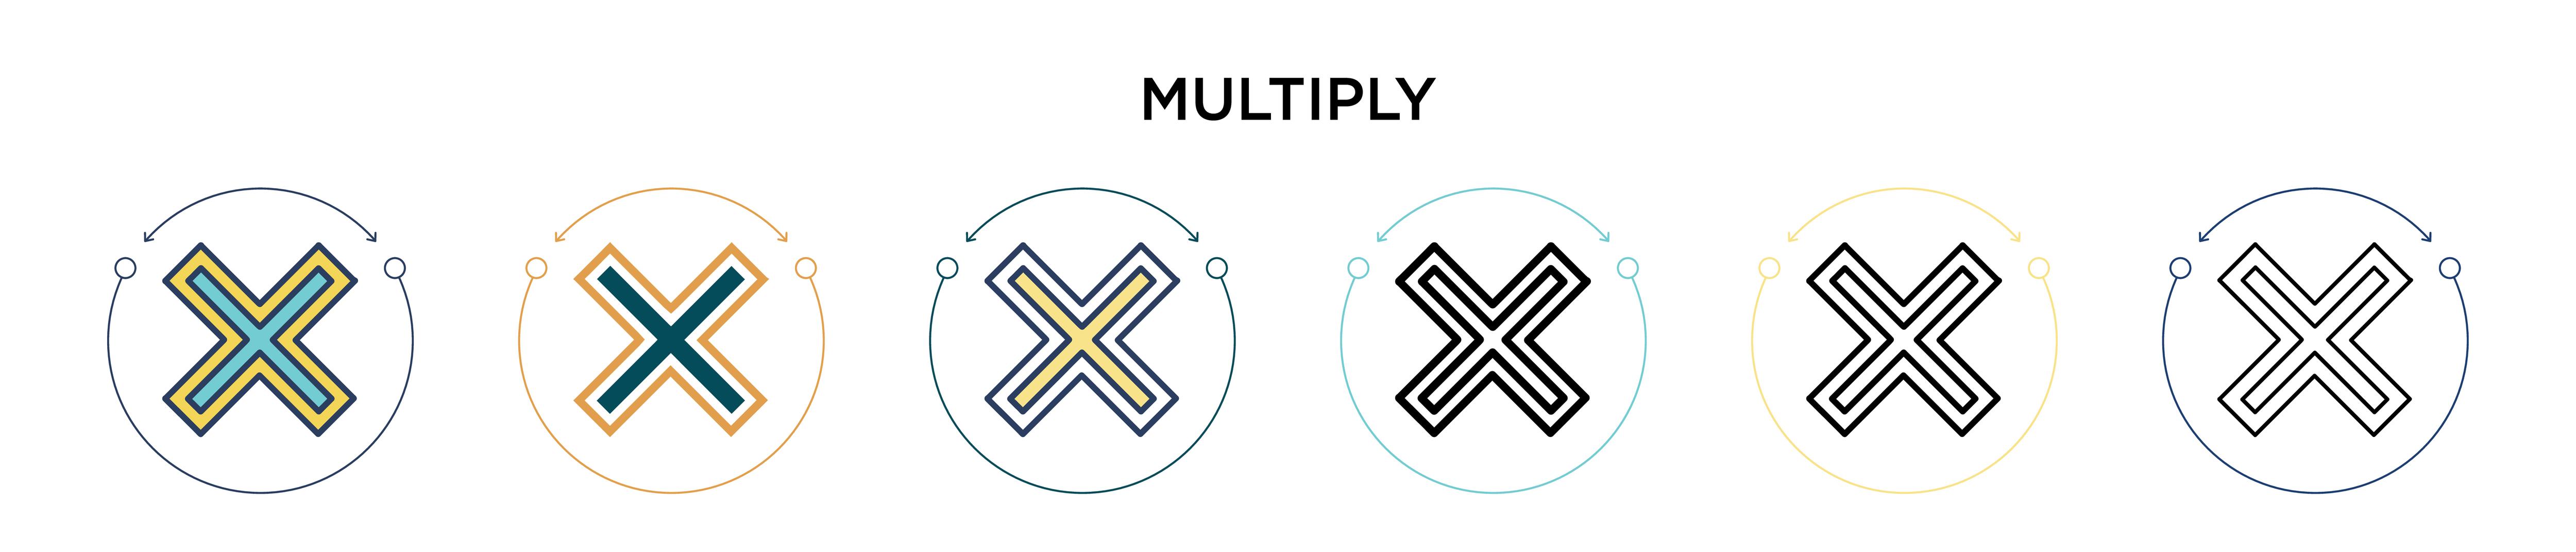 best-multiplication-app